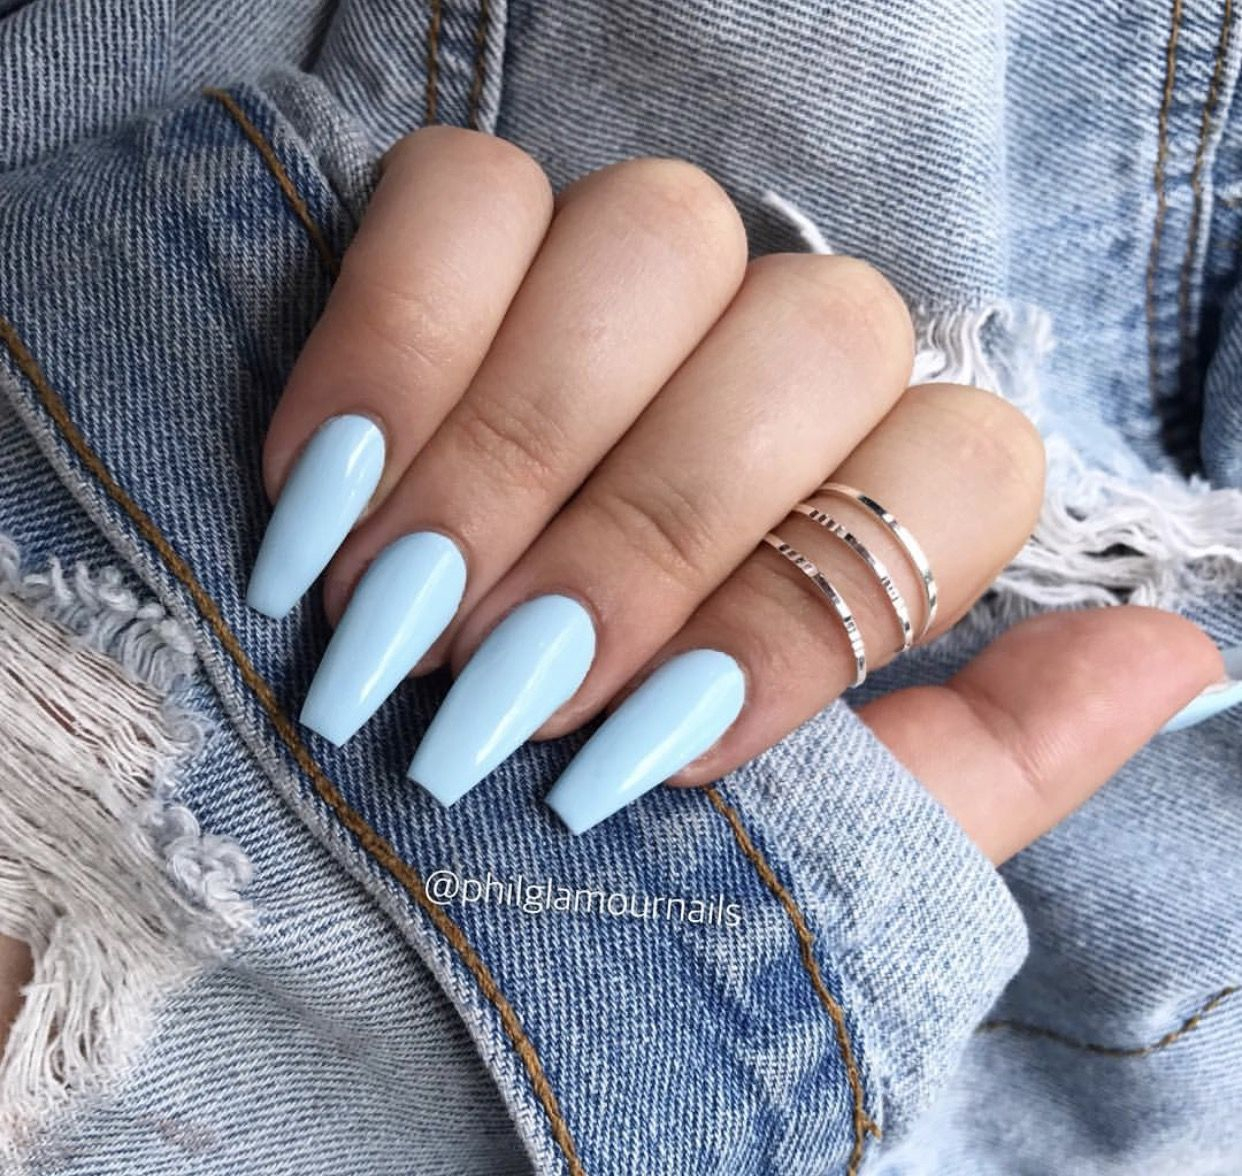 Beauty Nails Baby Blue Blue Nails Acrylics Acrylic Nails Blue Acrylic Nails Pretty Acrylic Nails Coffin Shape Nails